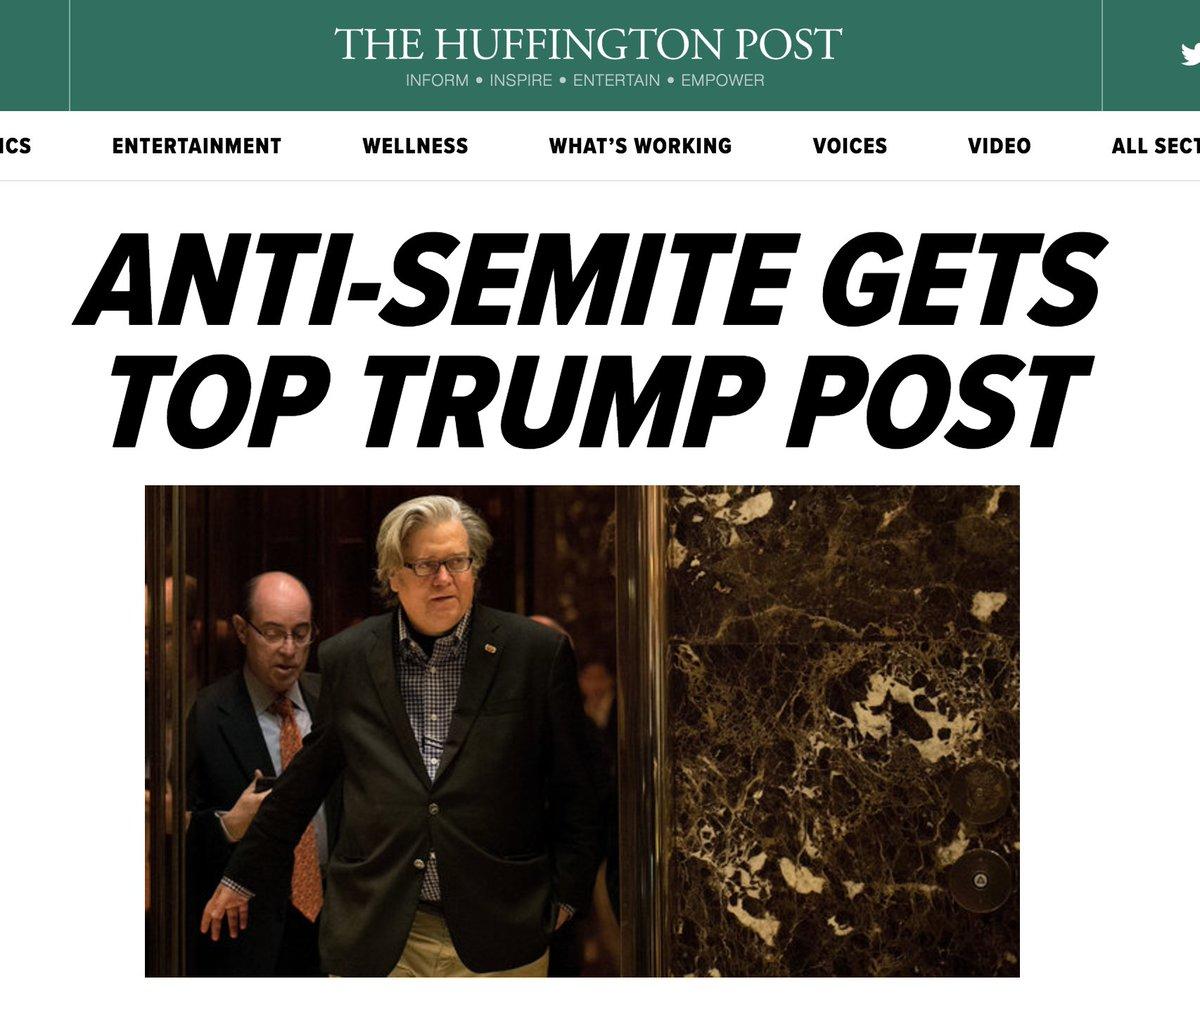 Current @HuffingtonPost headline: